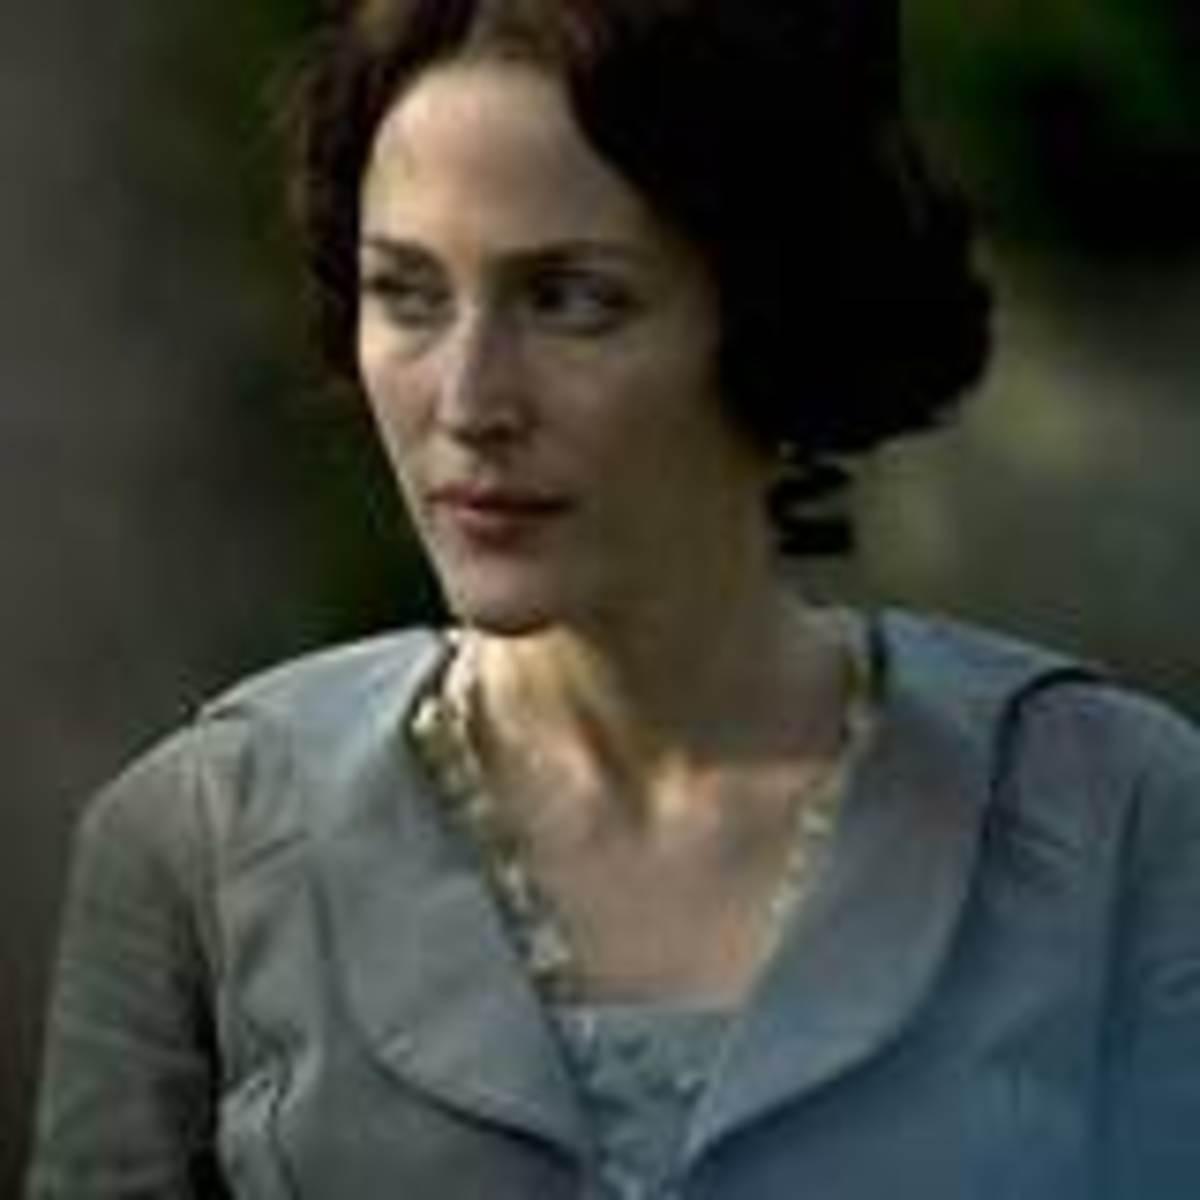 Gillian Anderson as Lady Dedlock, what is her secret?